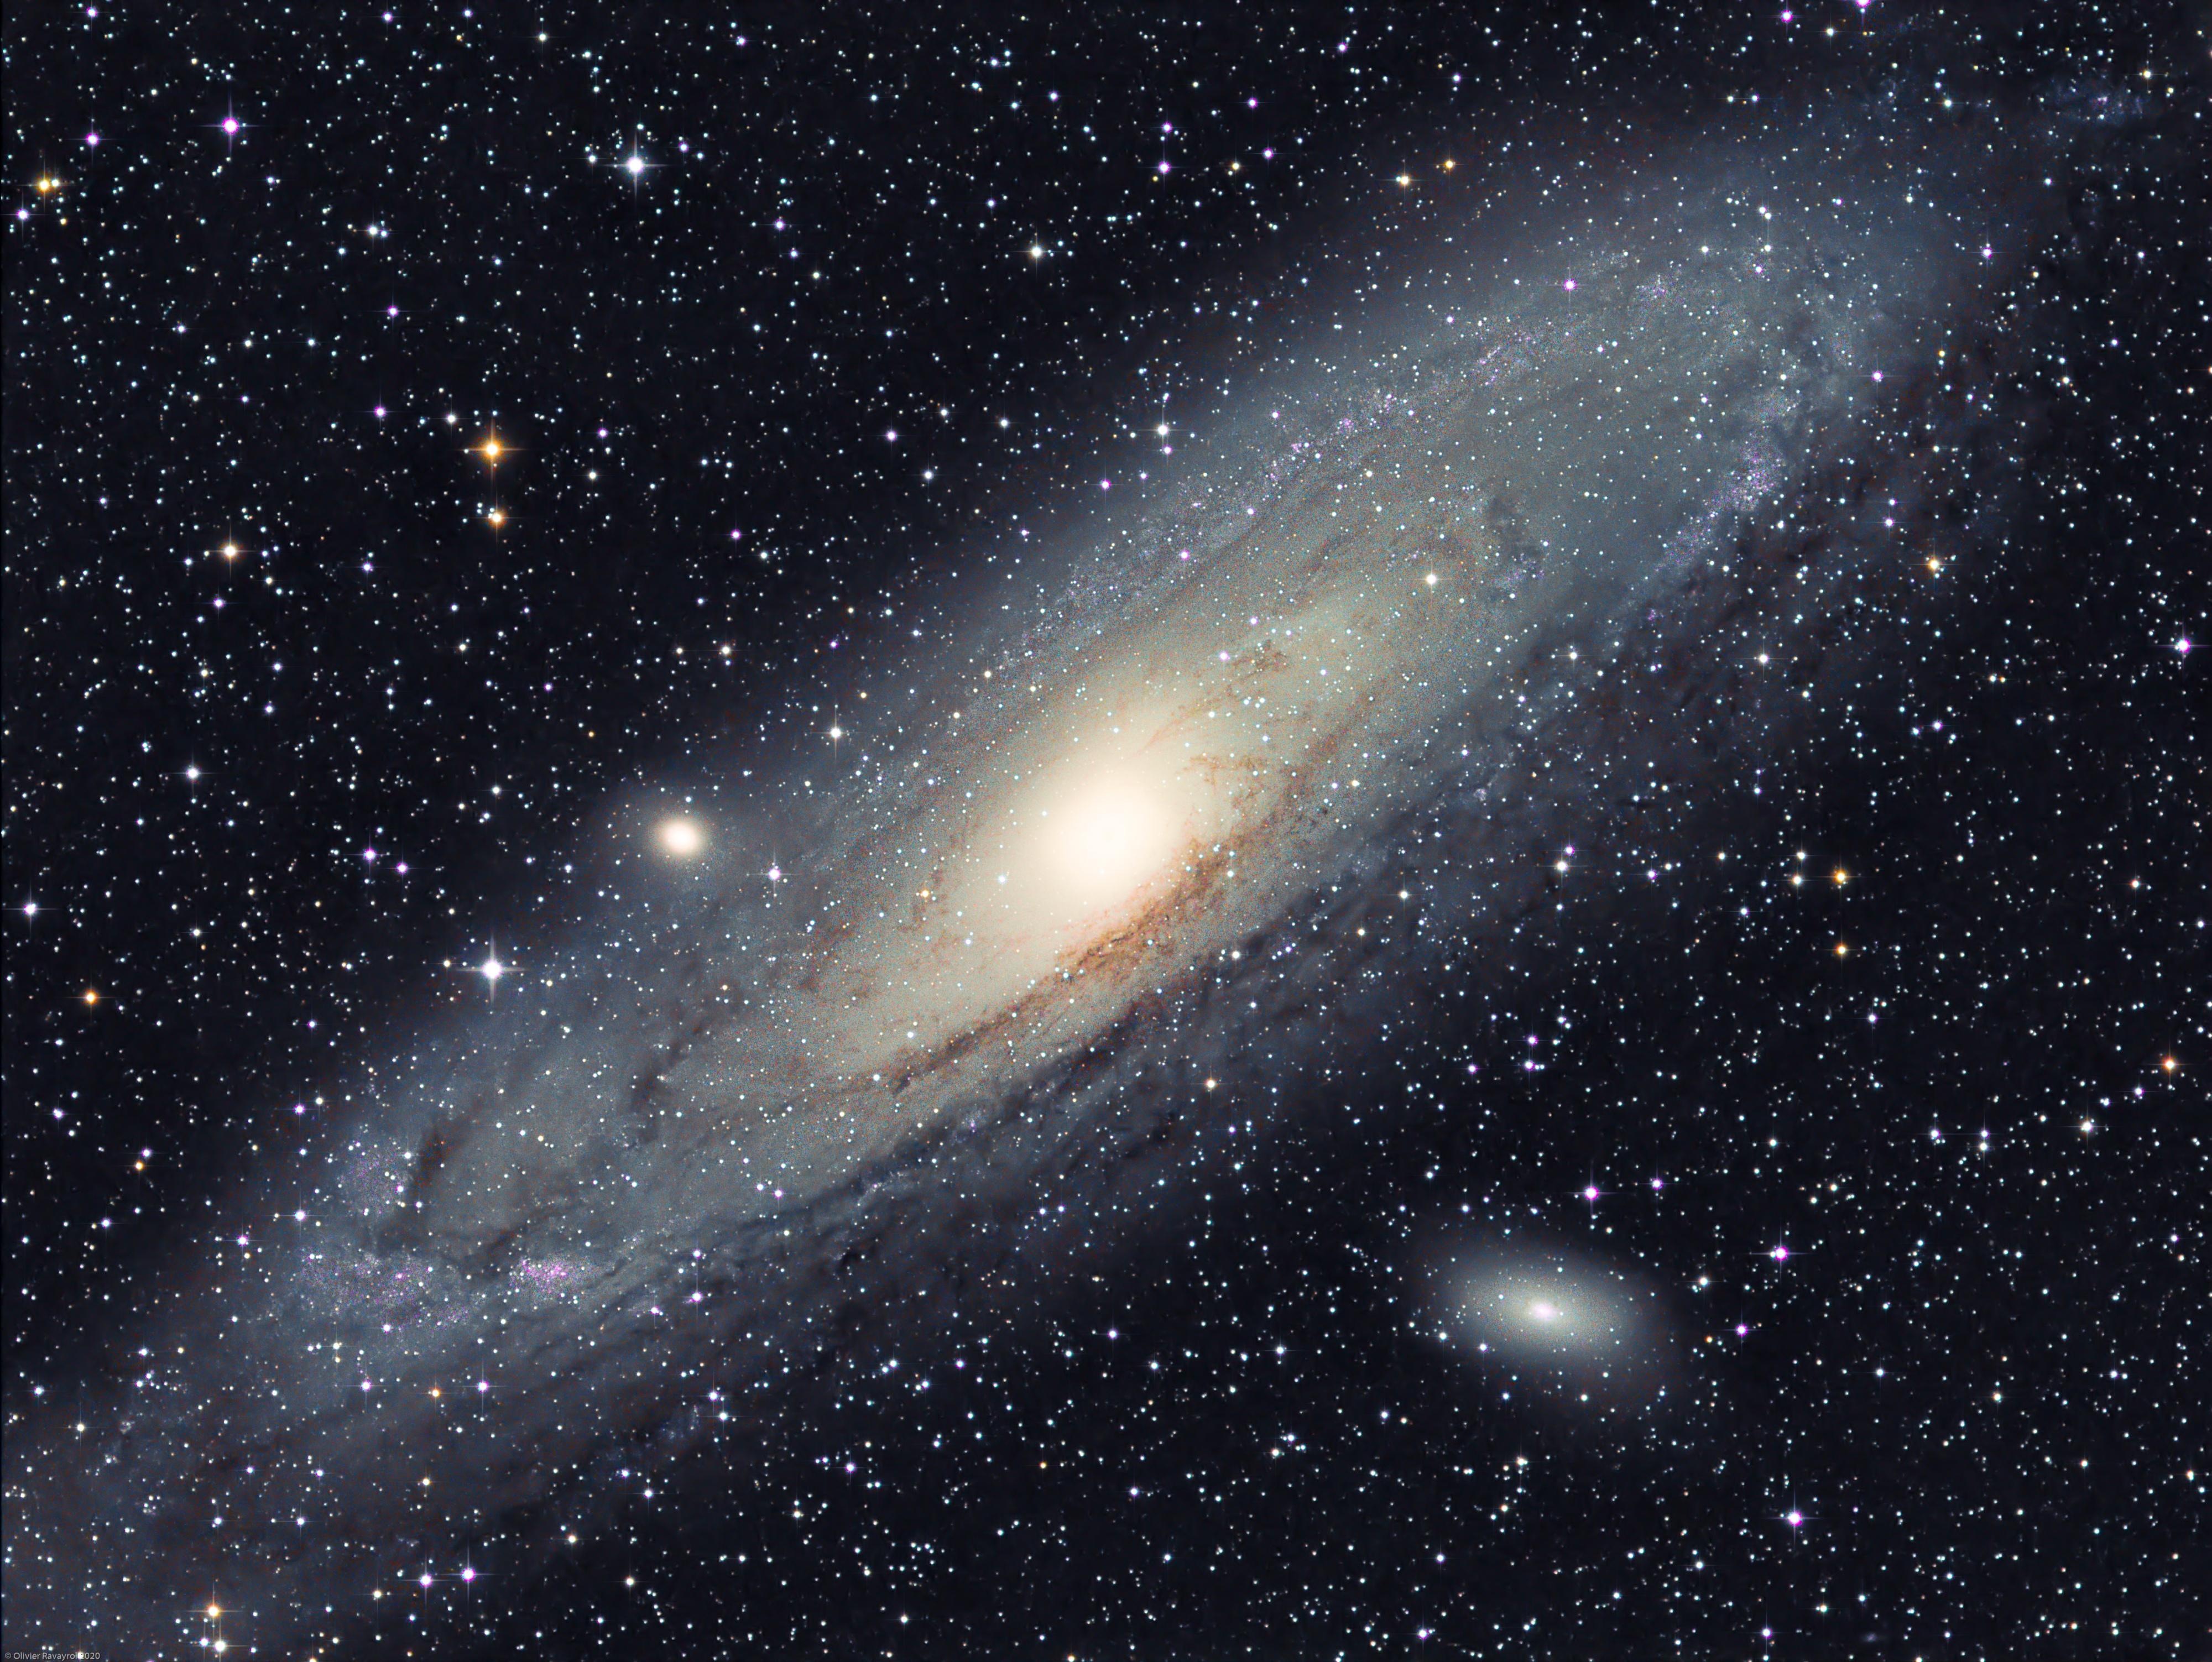 La galaxie d'Andromède - M31 (L-RGB)